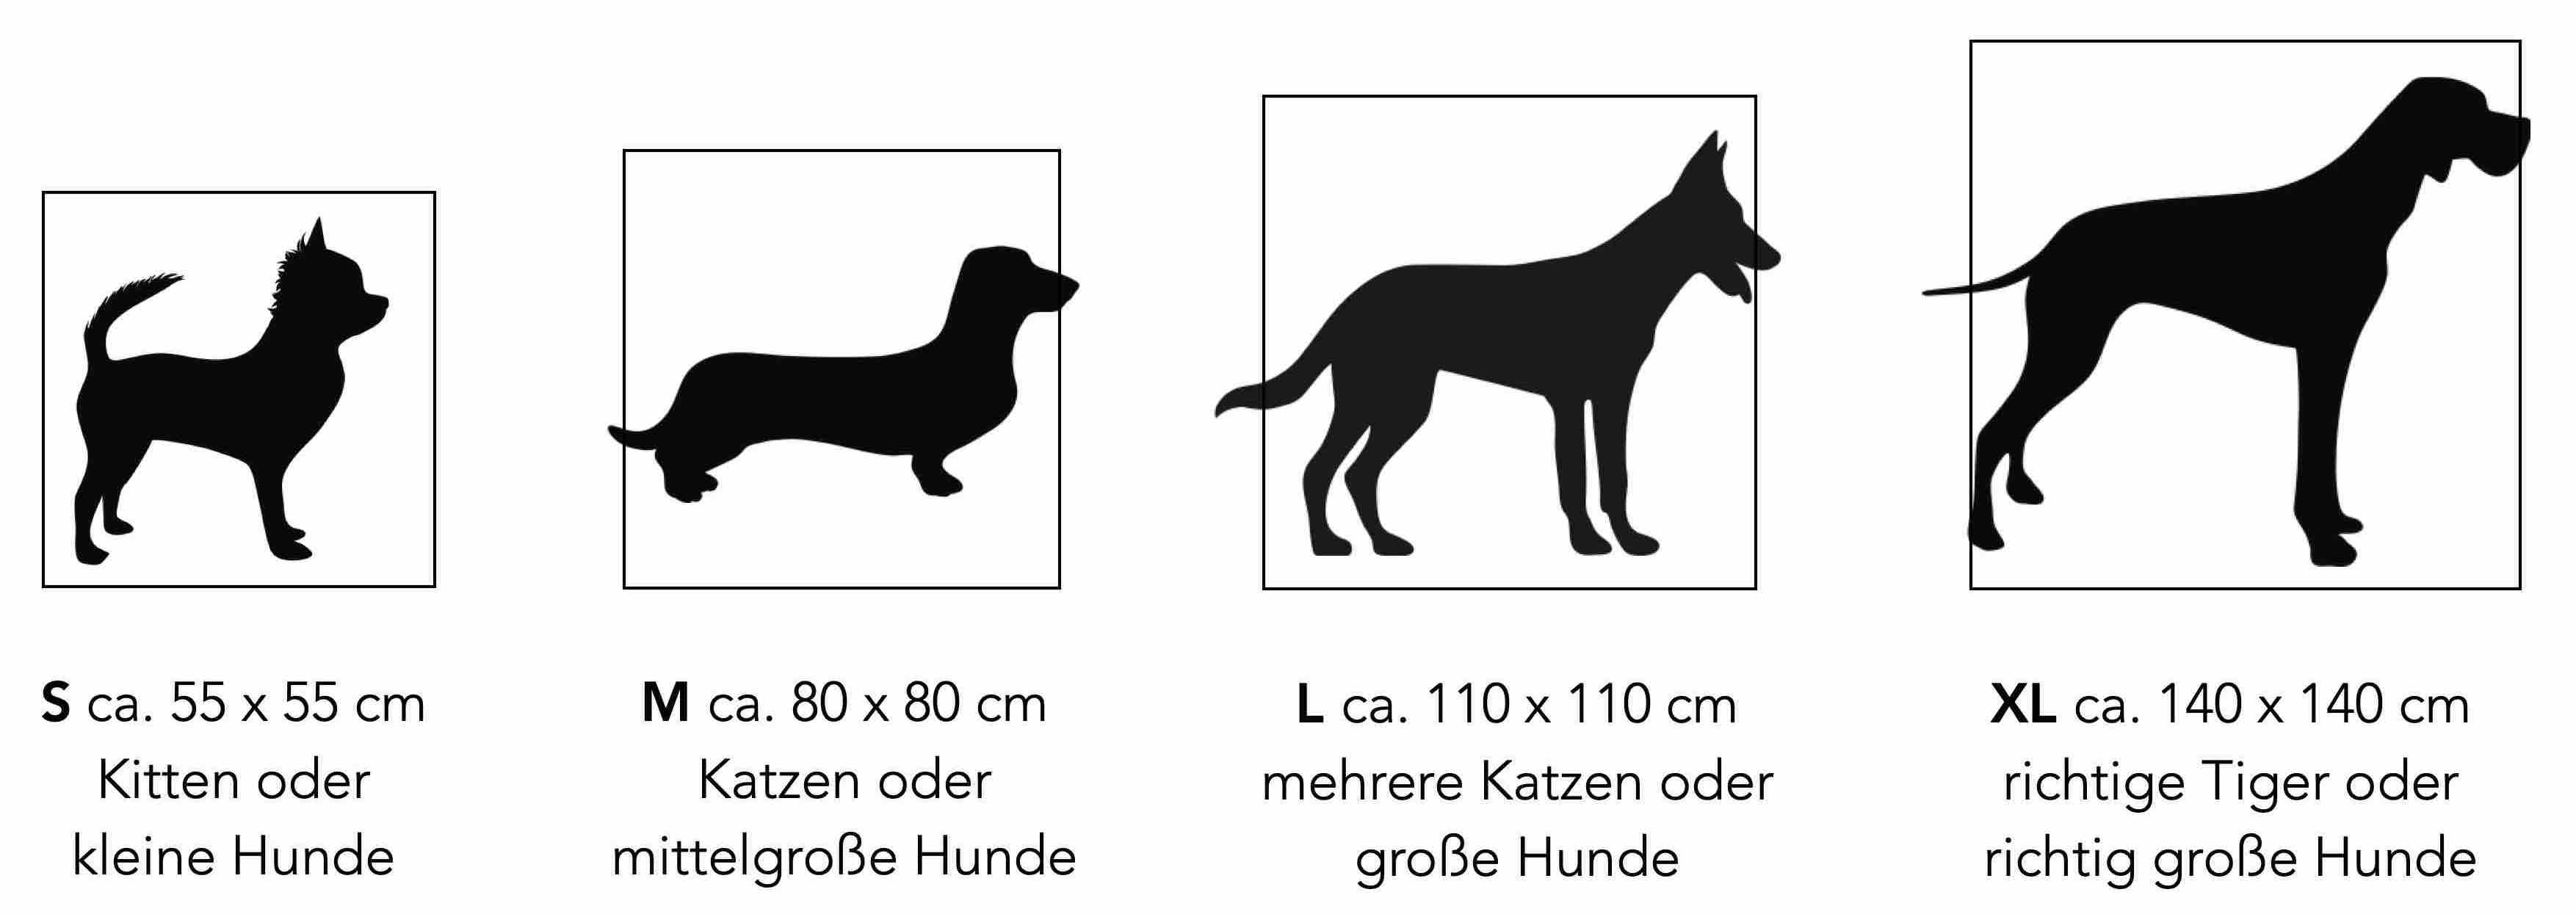 Hunde-Hund-Katze-Katzen-Groesse-Groesse-Hundebett-Hundekissen-Hundebetten-Katzenbett-Katzenkissen